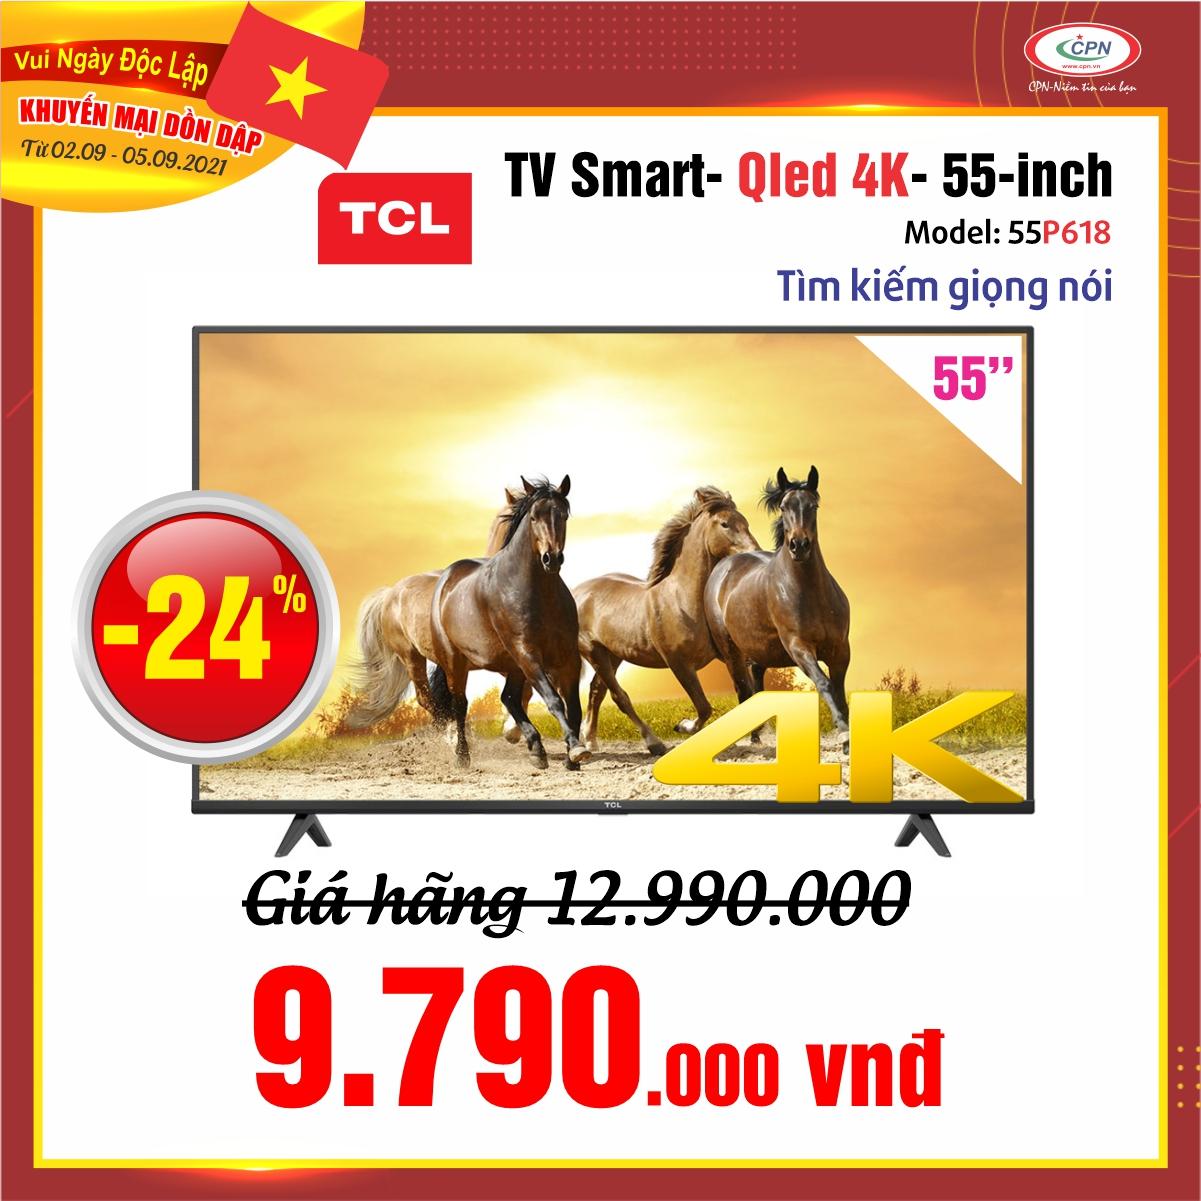 900x900-quoc-khanh-2021-55p618.jpg